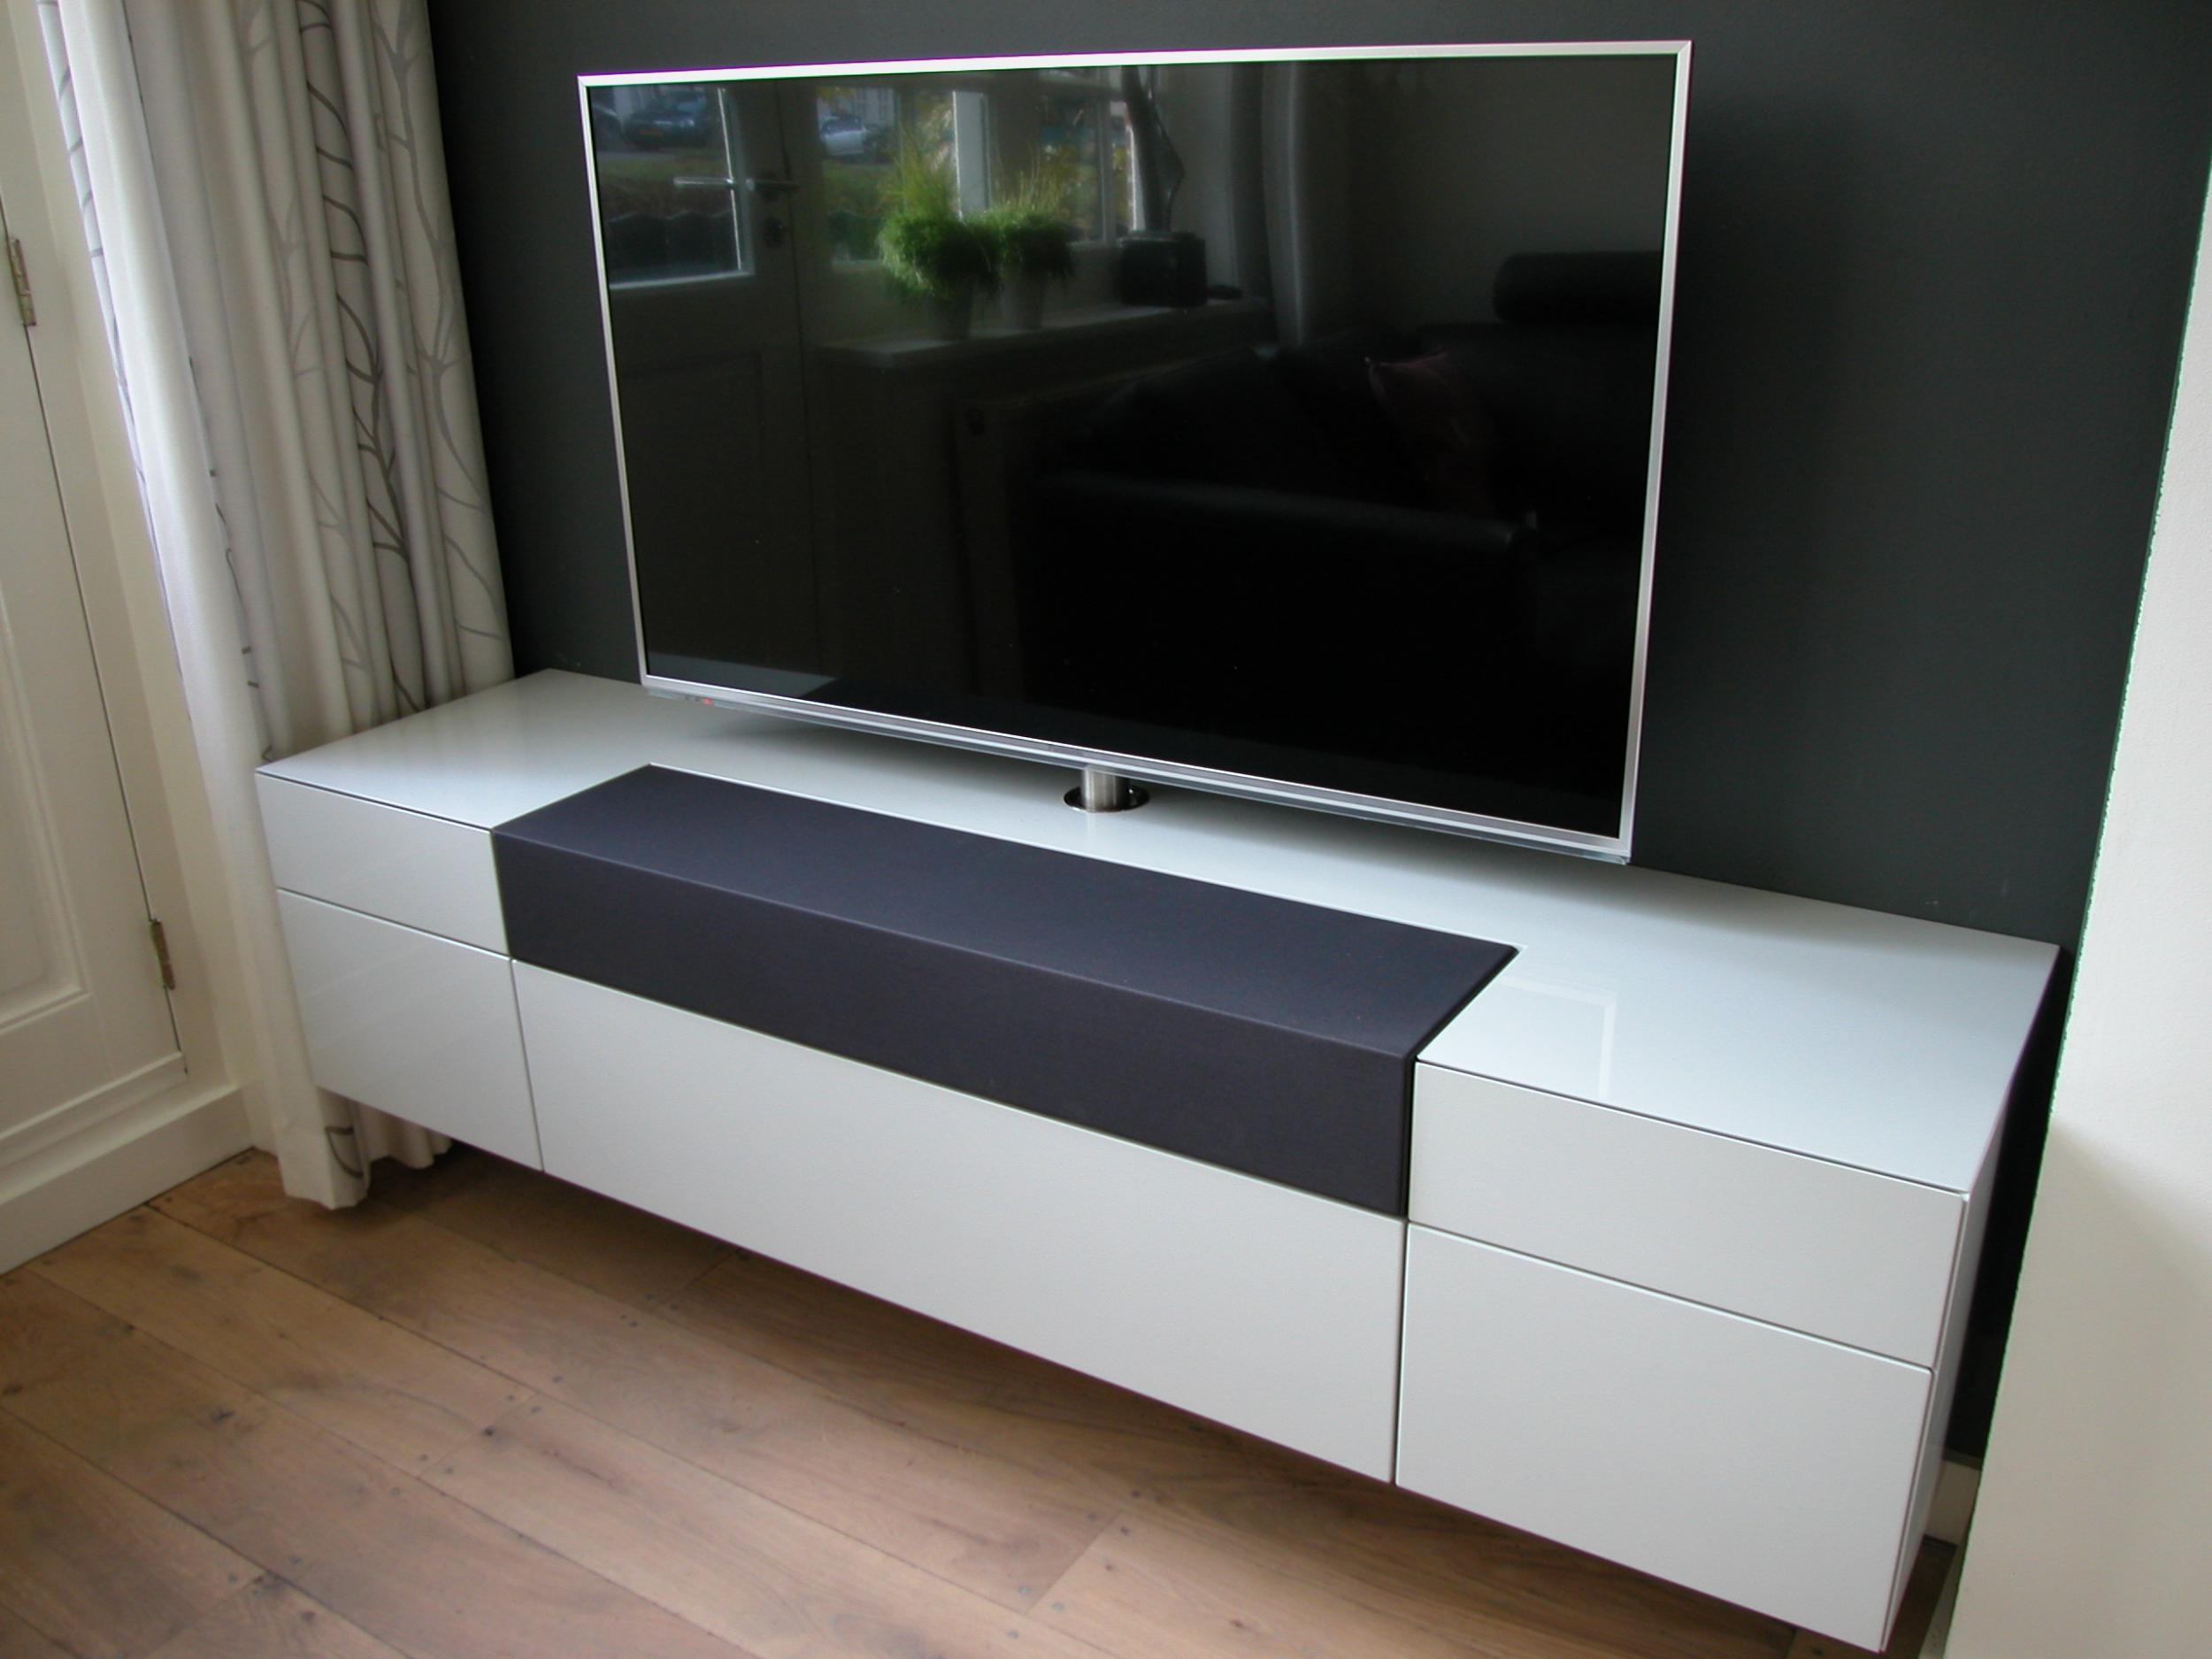 Artyx The New Design Vision Avs 180 Custom Sonos